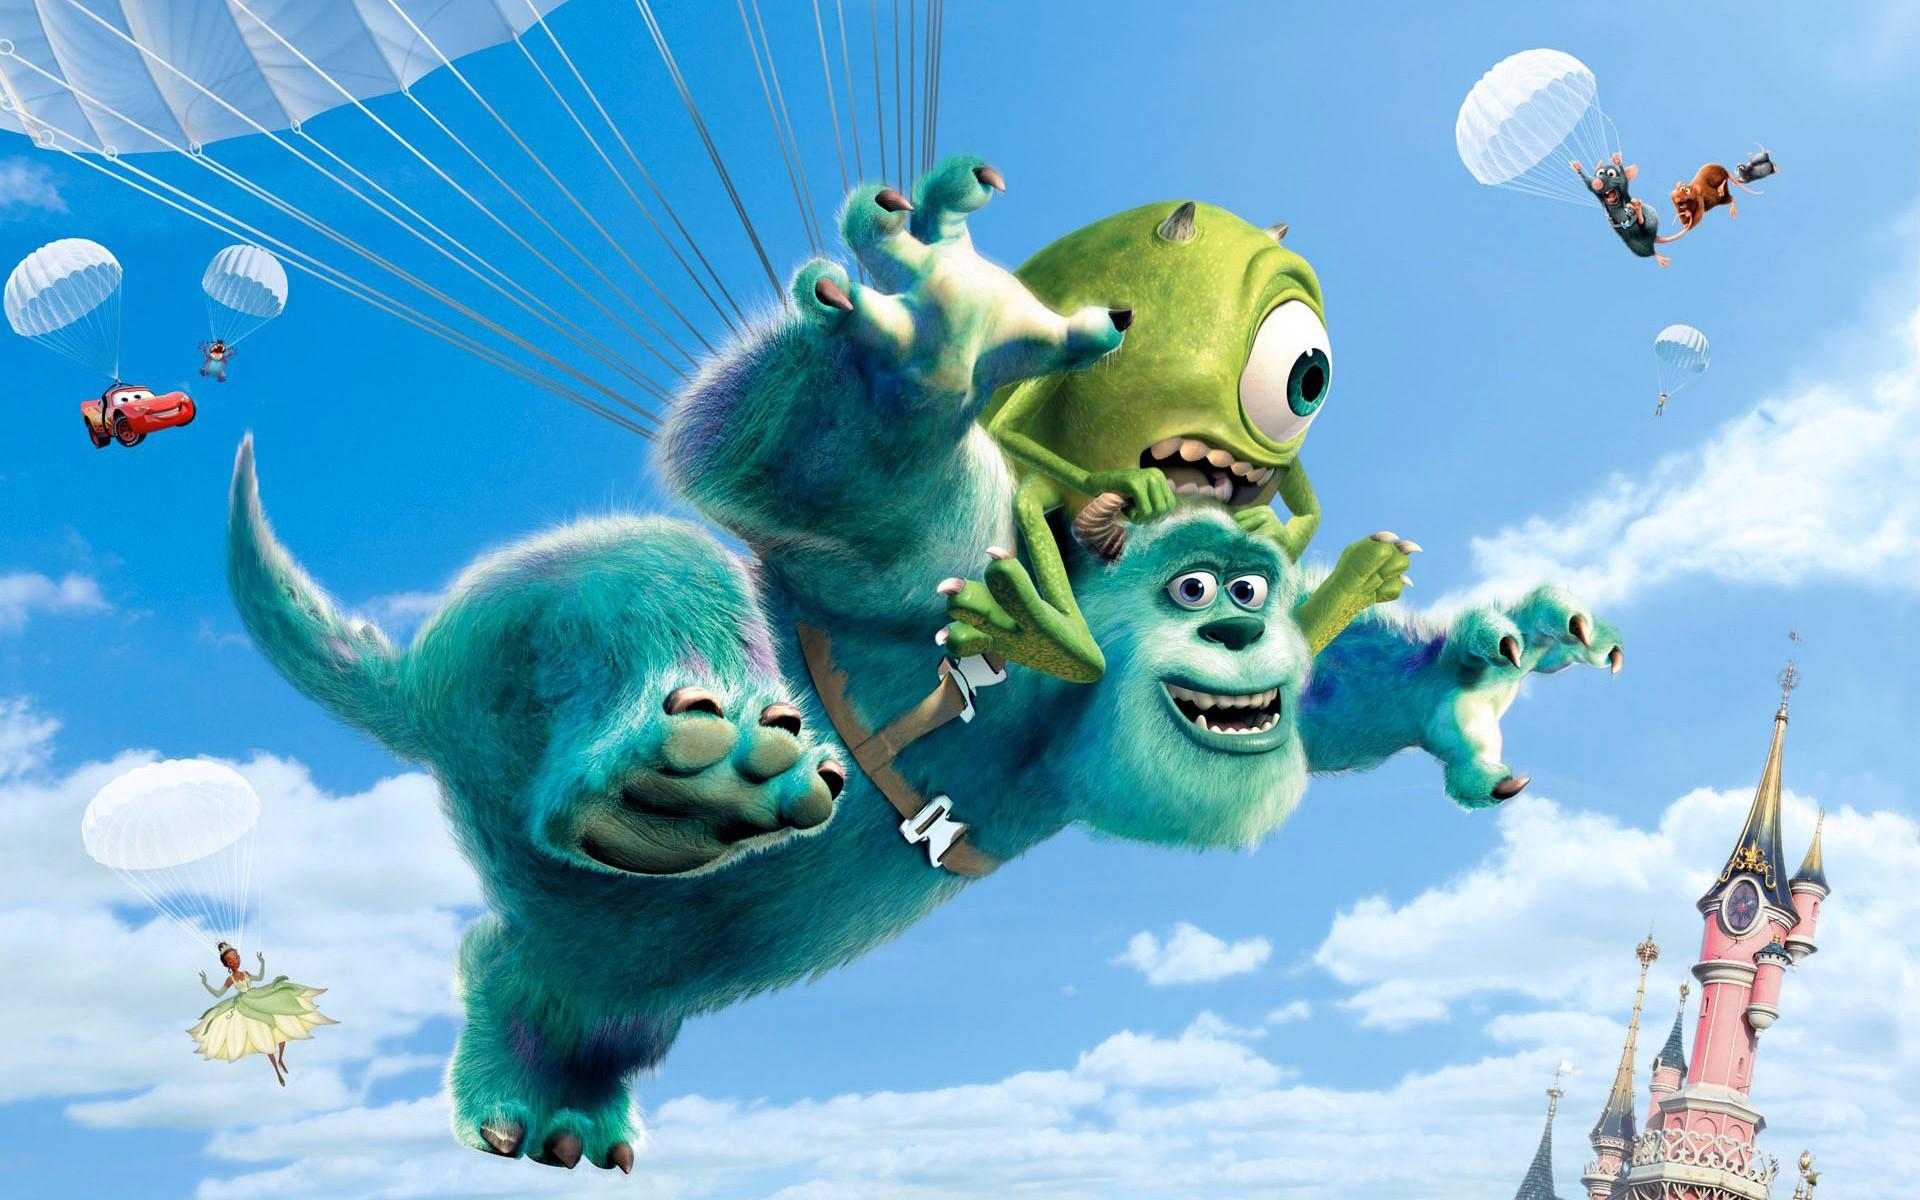 Disney Movies Monsters University Wallpapers | HD Wallpapers